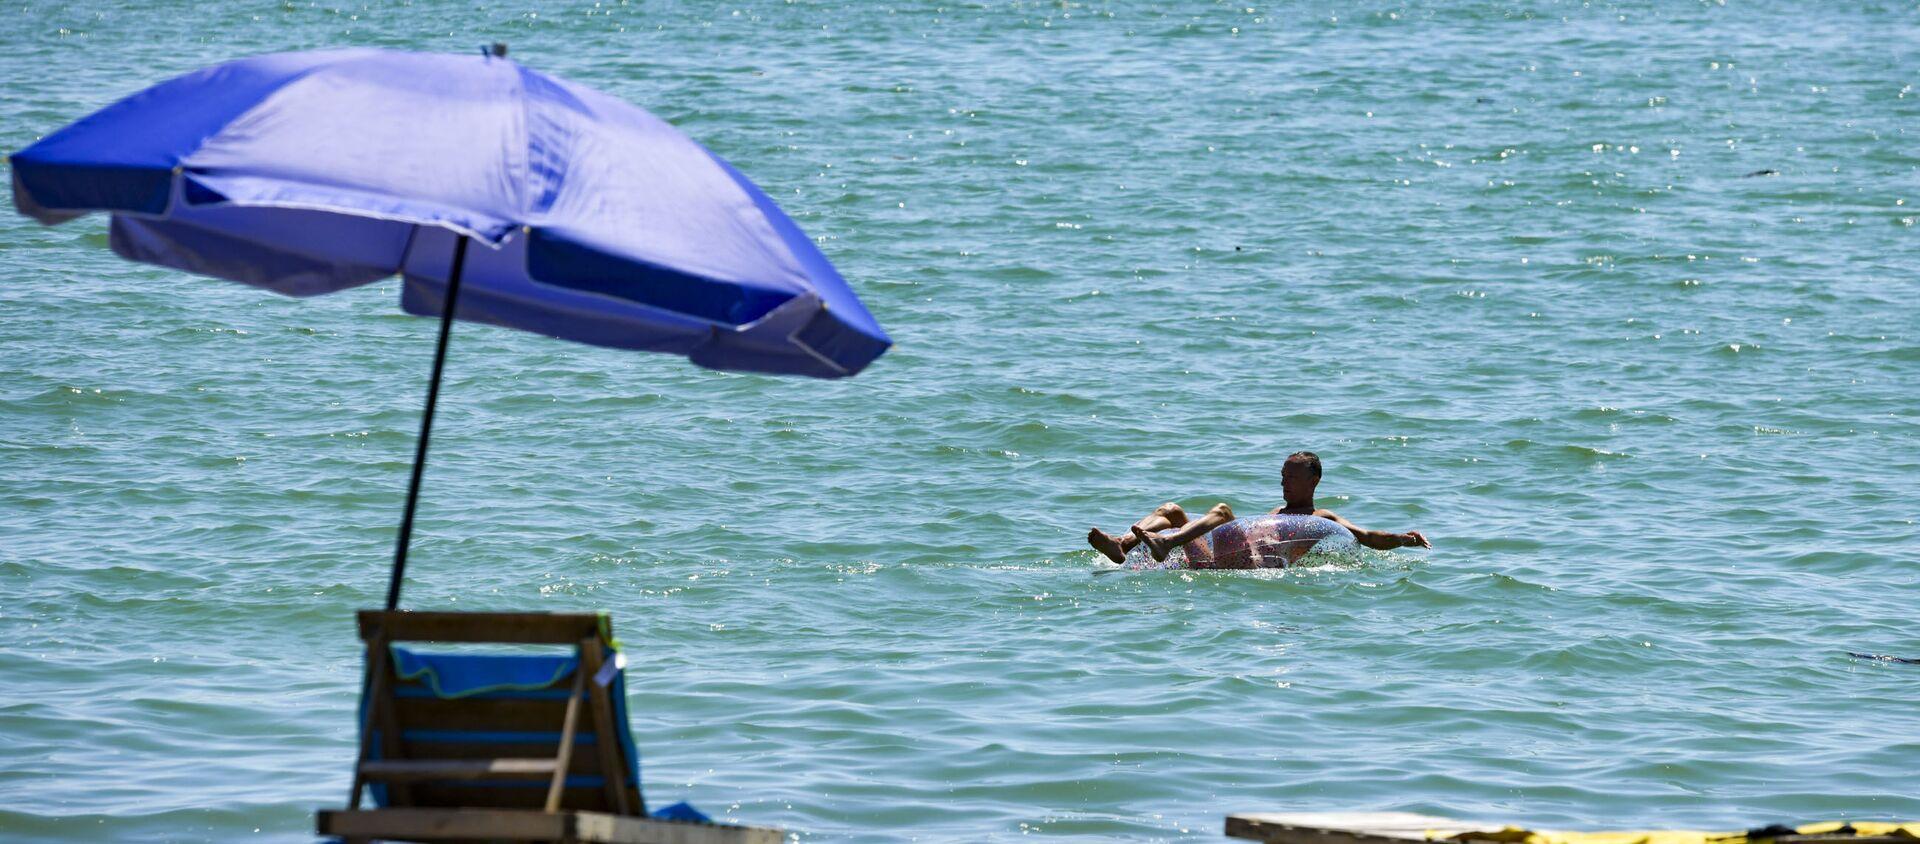 Мужчина купается на круге в море  - Sputnik Абхазия, 1920, 04.08.2021